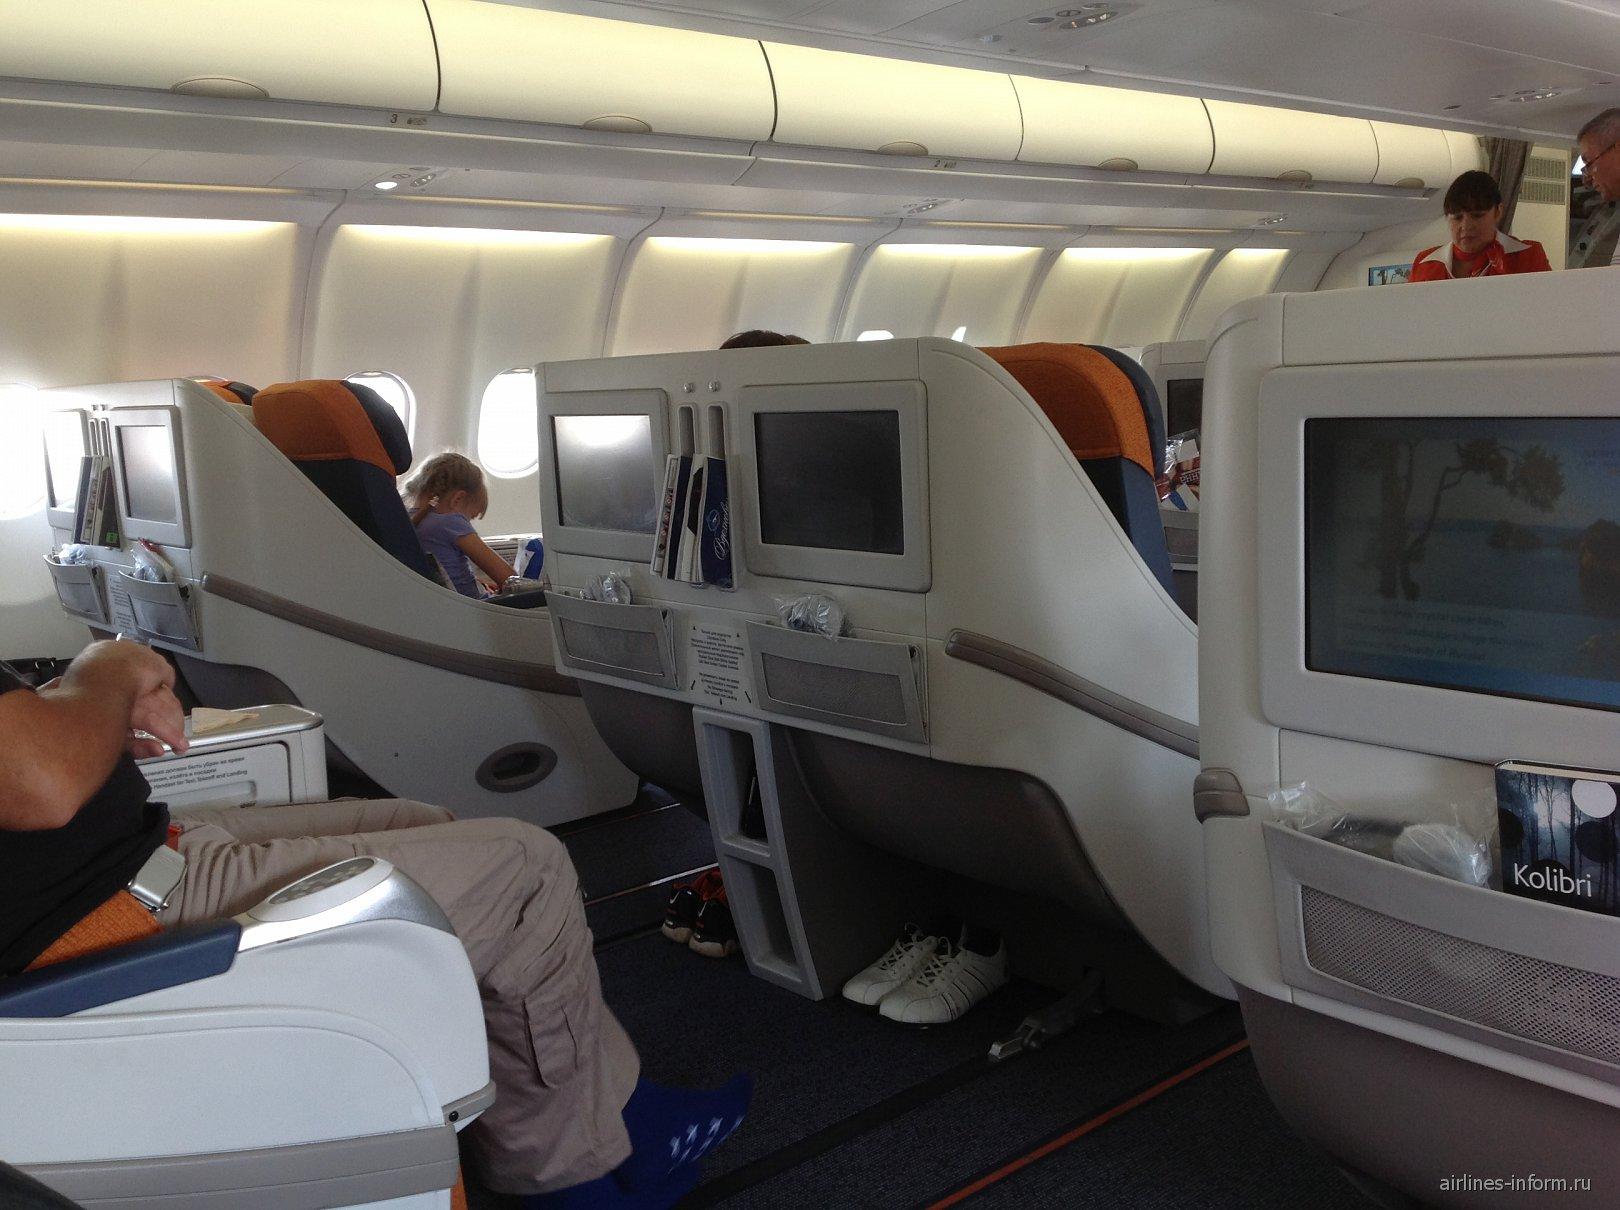 Салон бизнес-класса в самолета Airbus A330-300 авиакомпании Аэрофлот